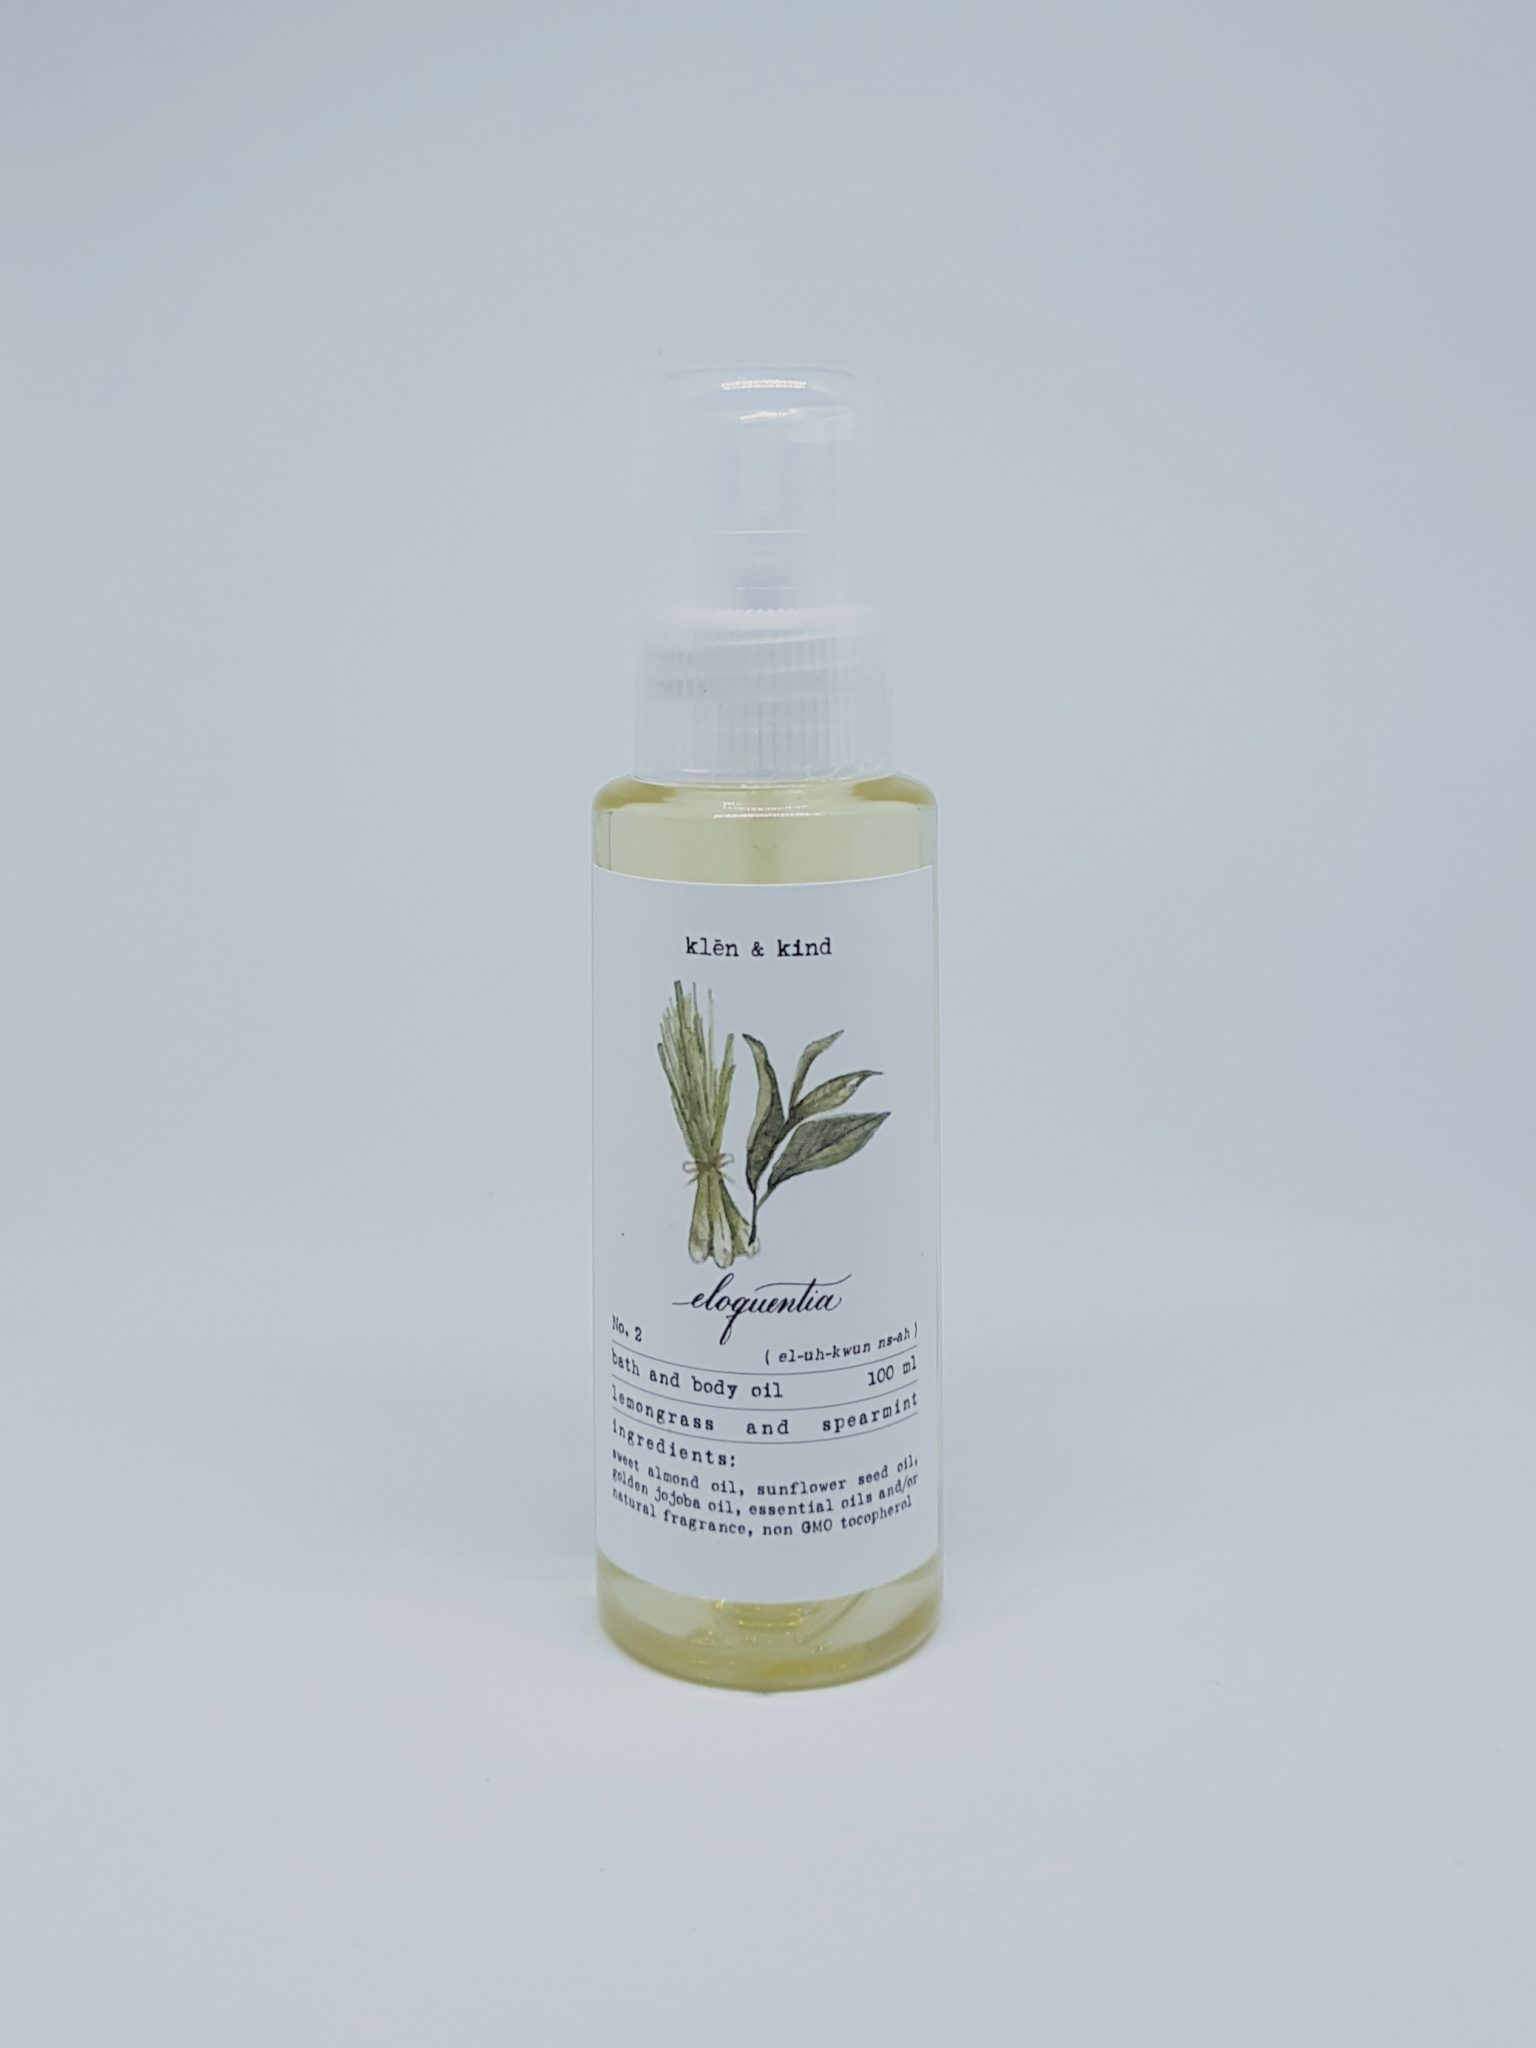 1e388bf42e12a Eloquentia Body Oil